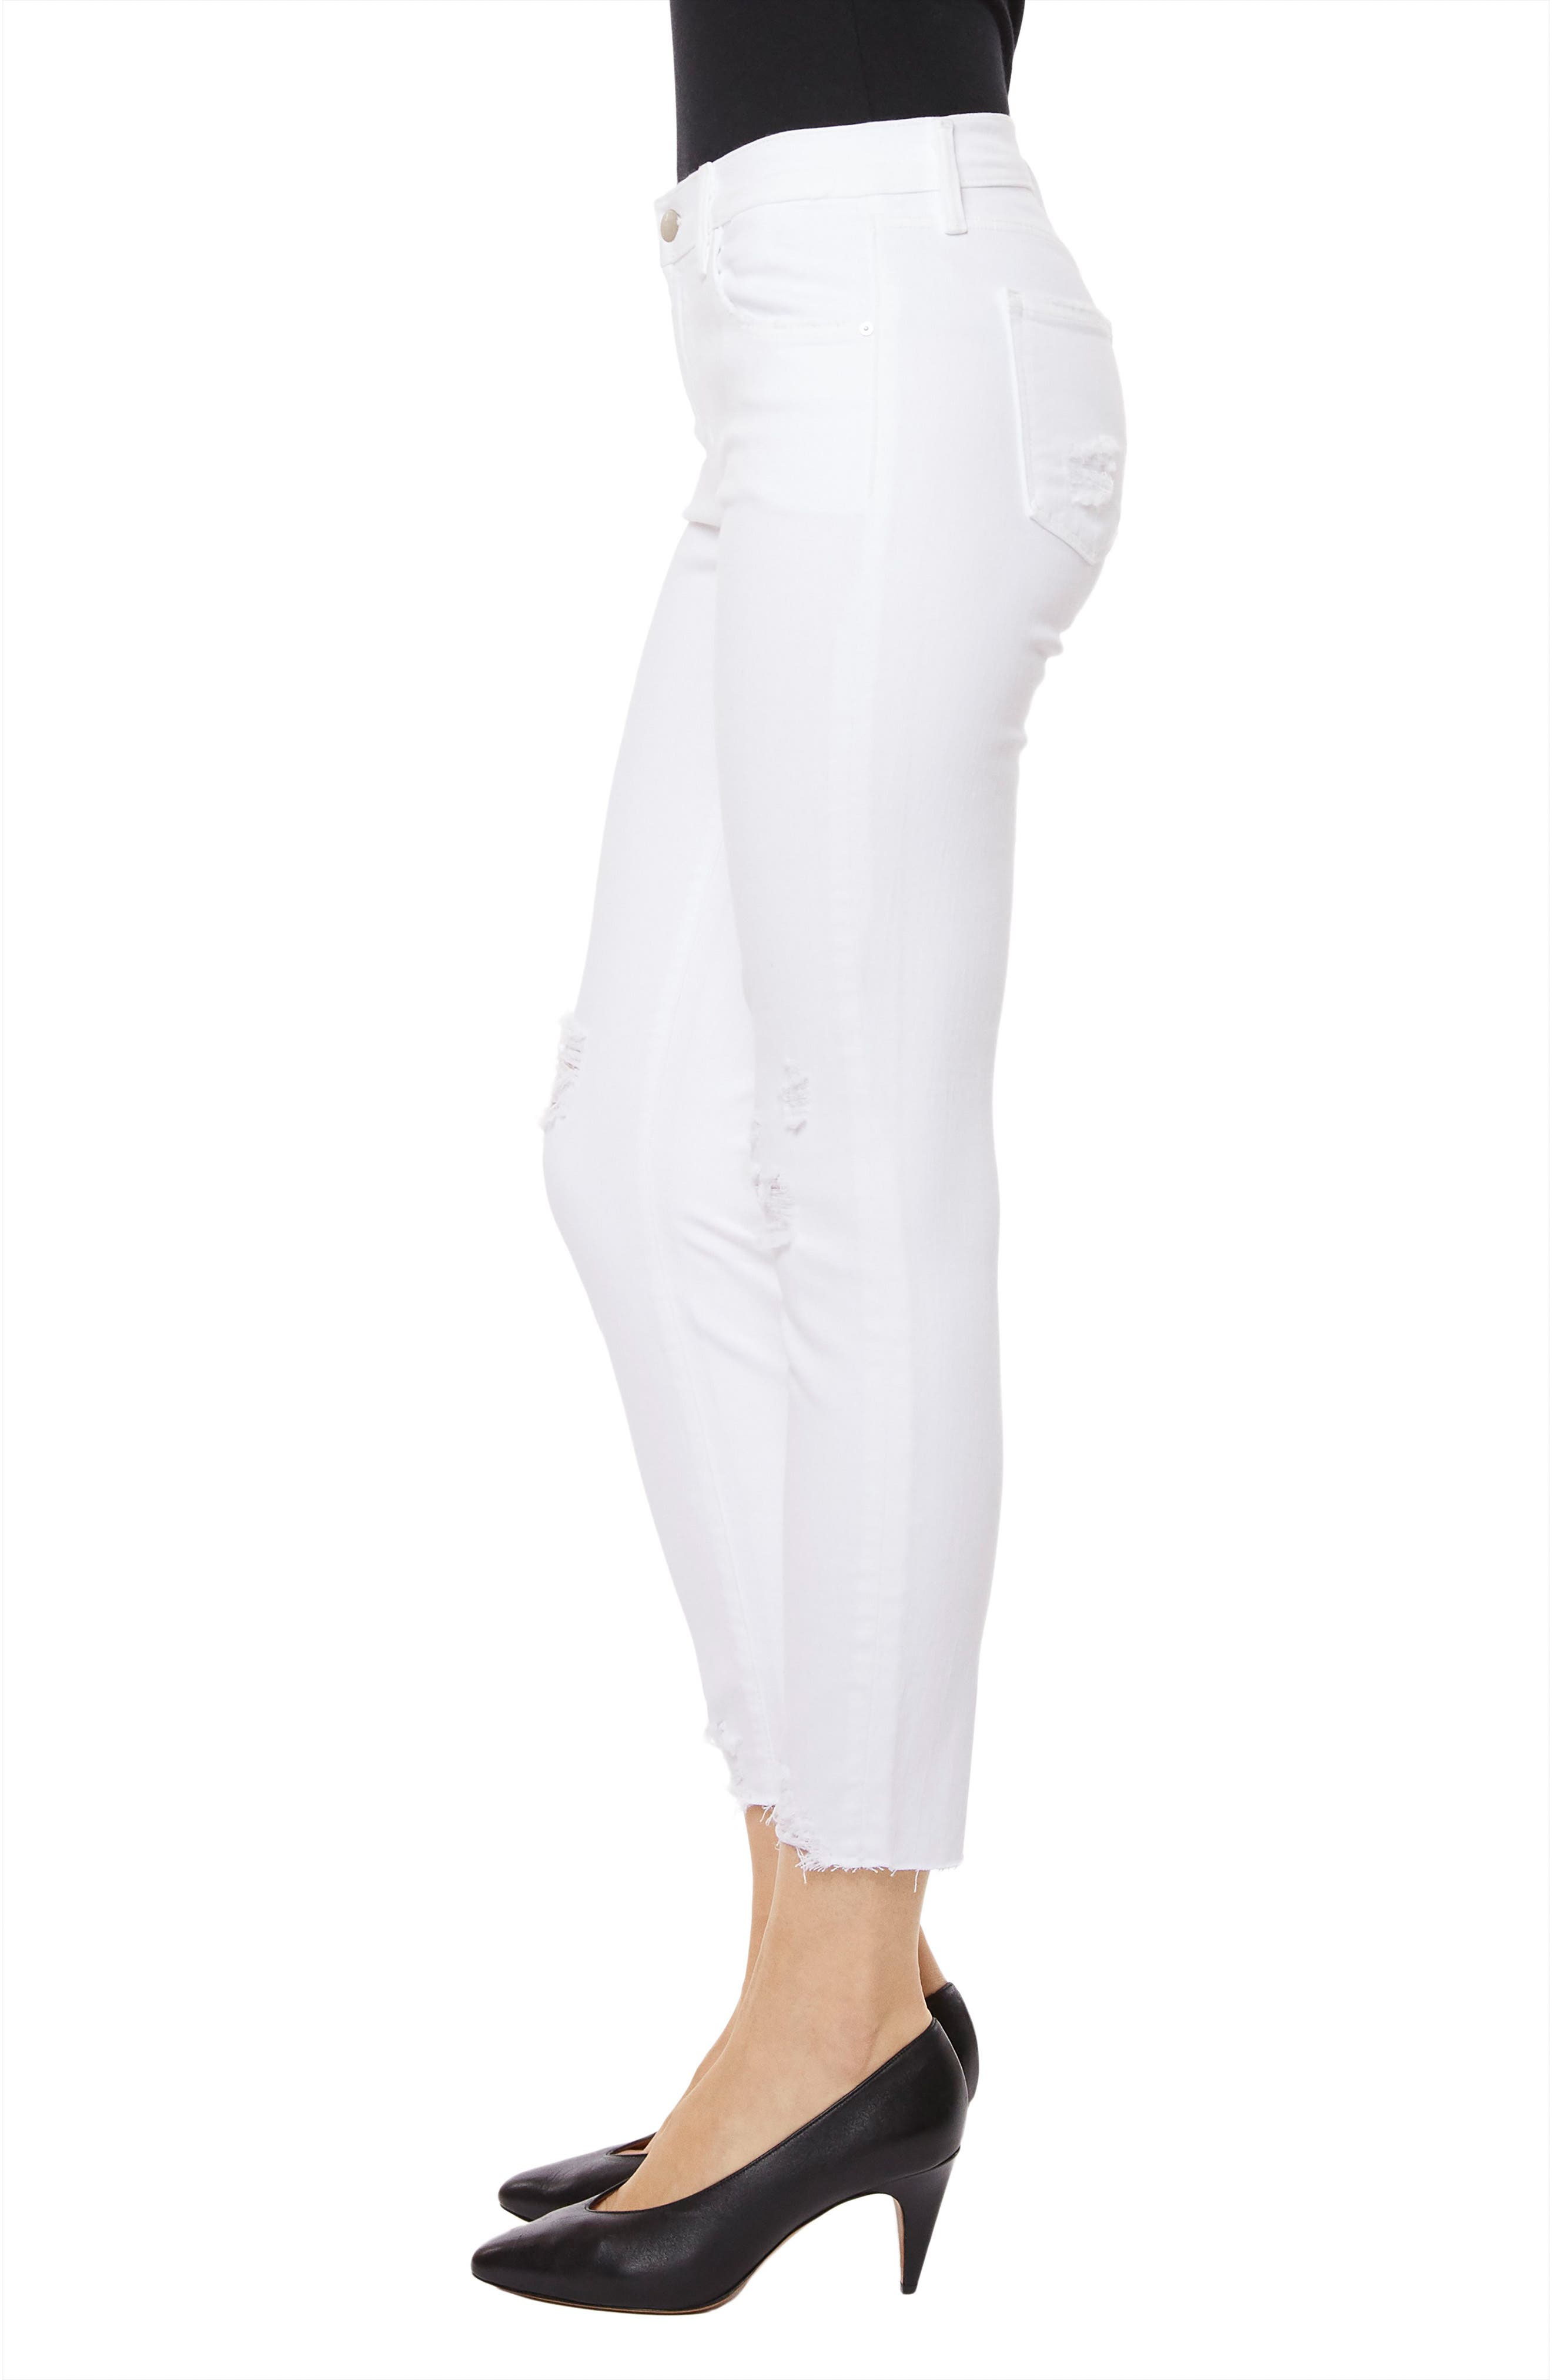 835 Capri Skinny Jeans,                             Alternate thumbnail 3, color,                             Underexposed